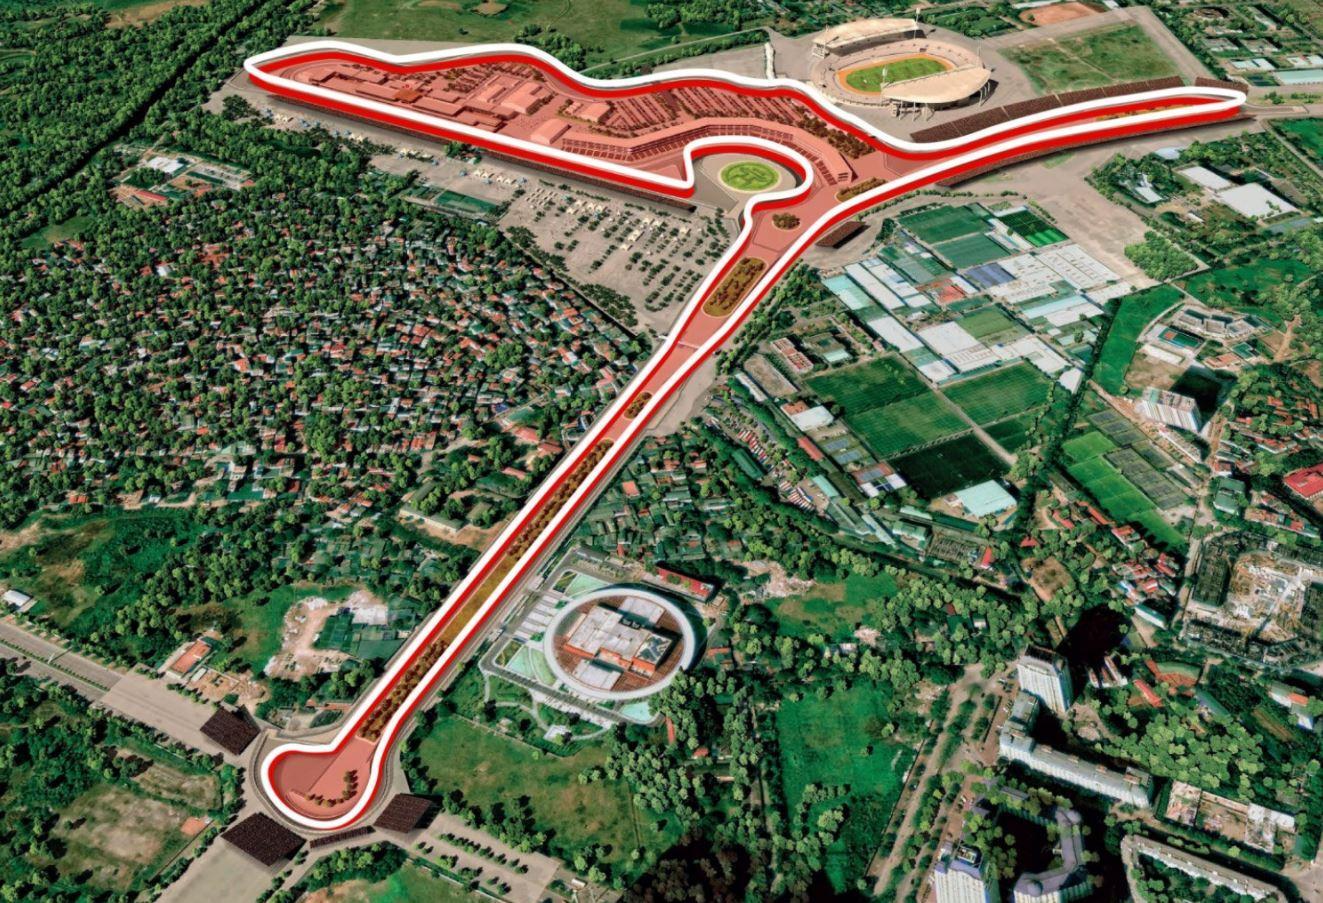 The Vietnam Grand Prix will kick off in 2020 in Hanoi